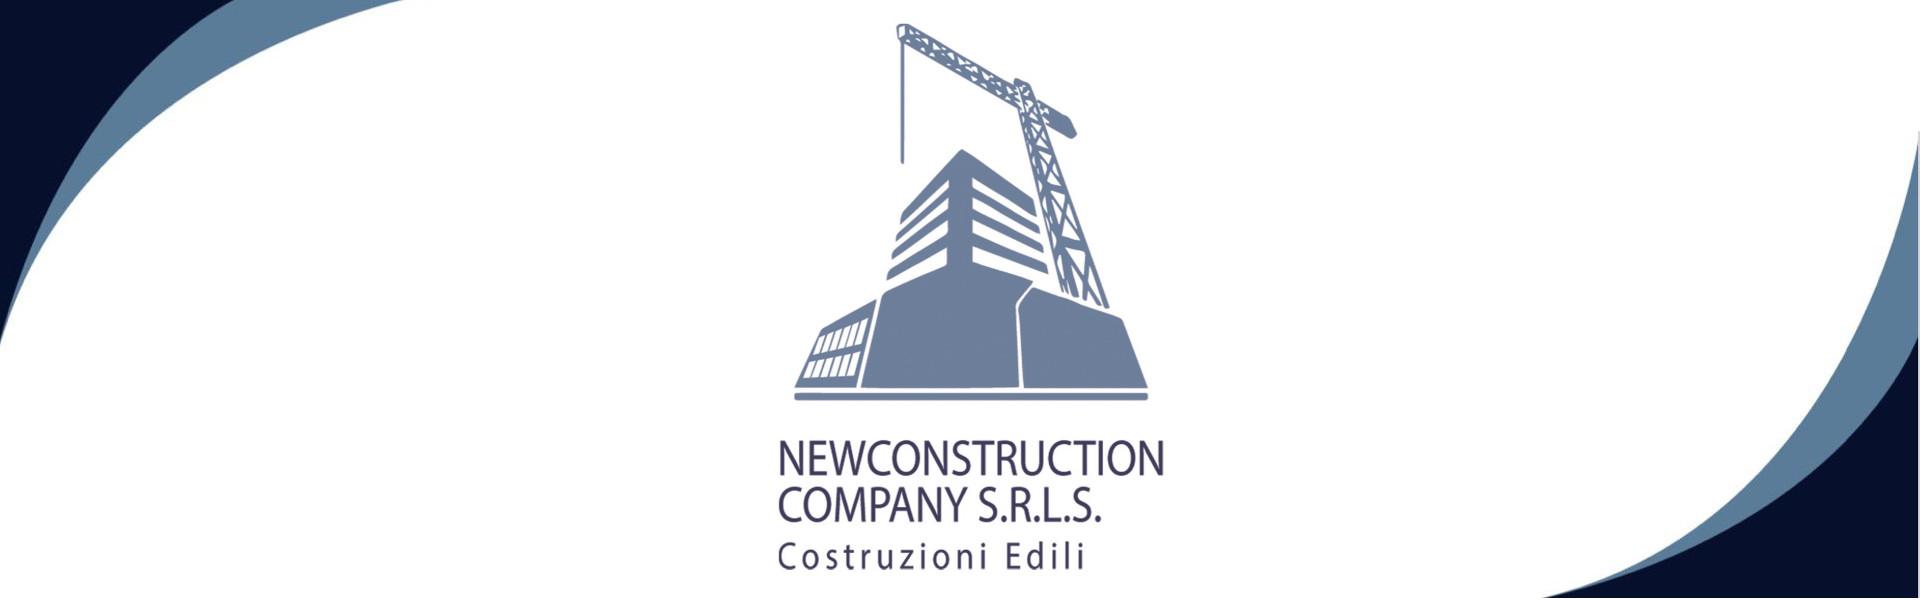 NEW CONSTRUCTION COMPANY SRLS